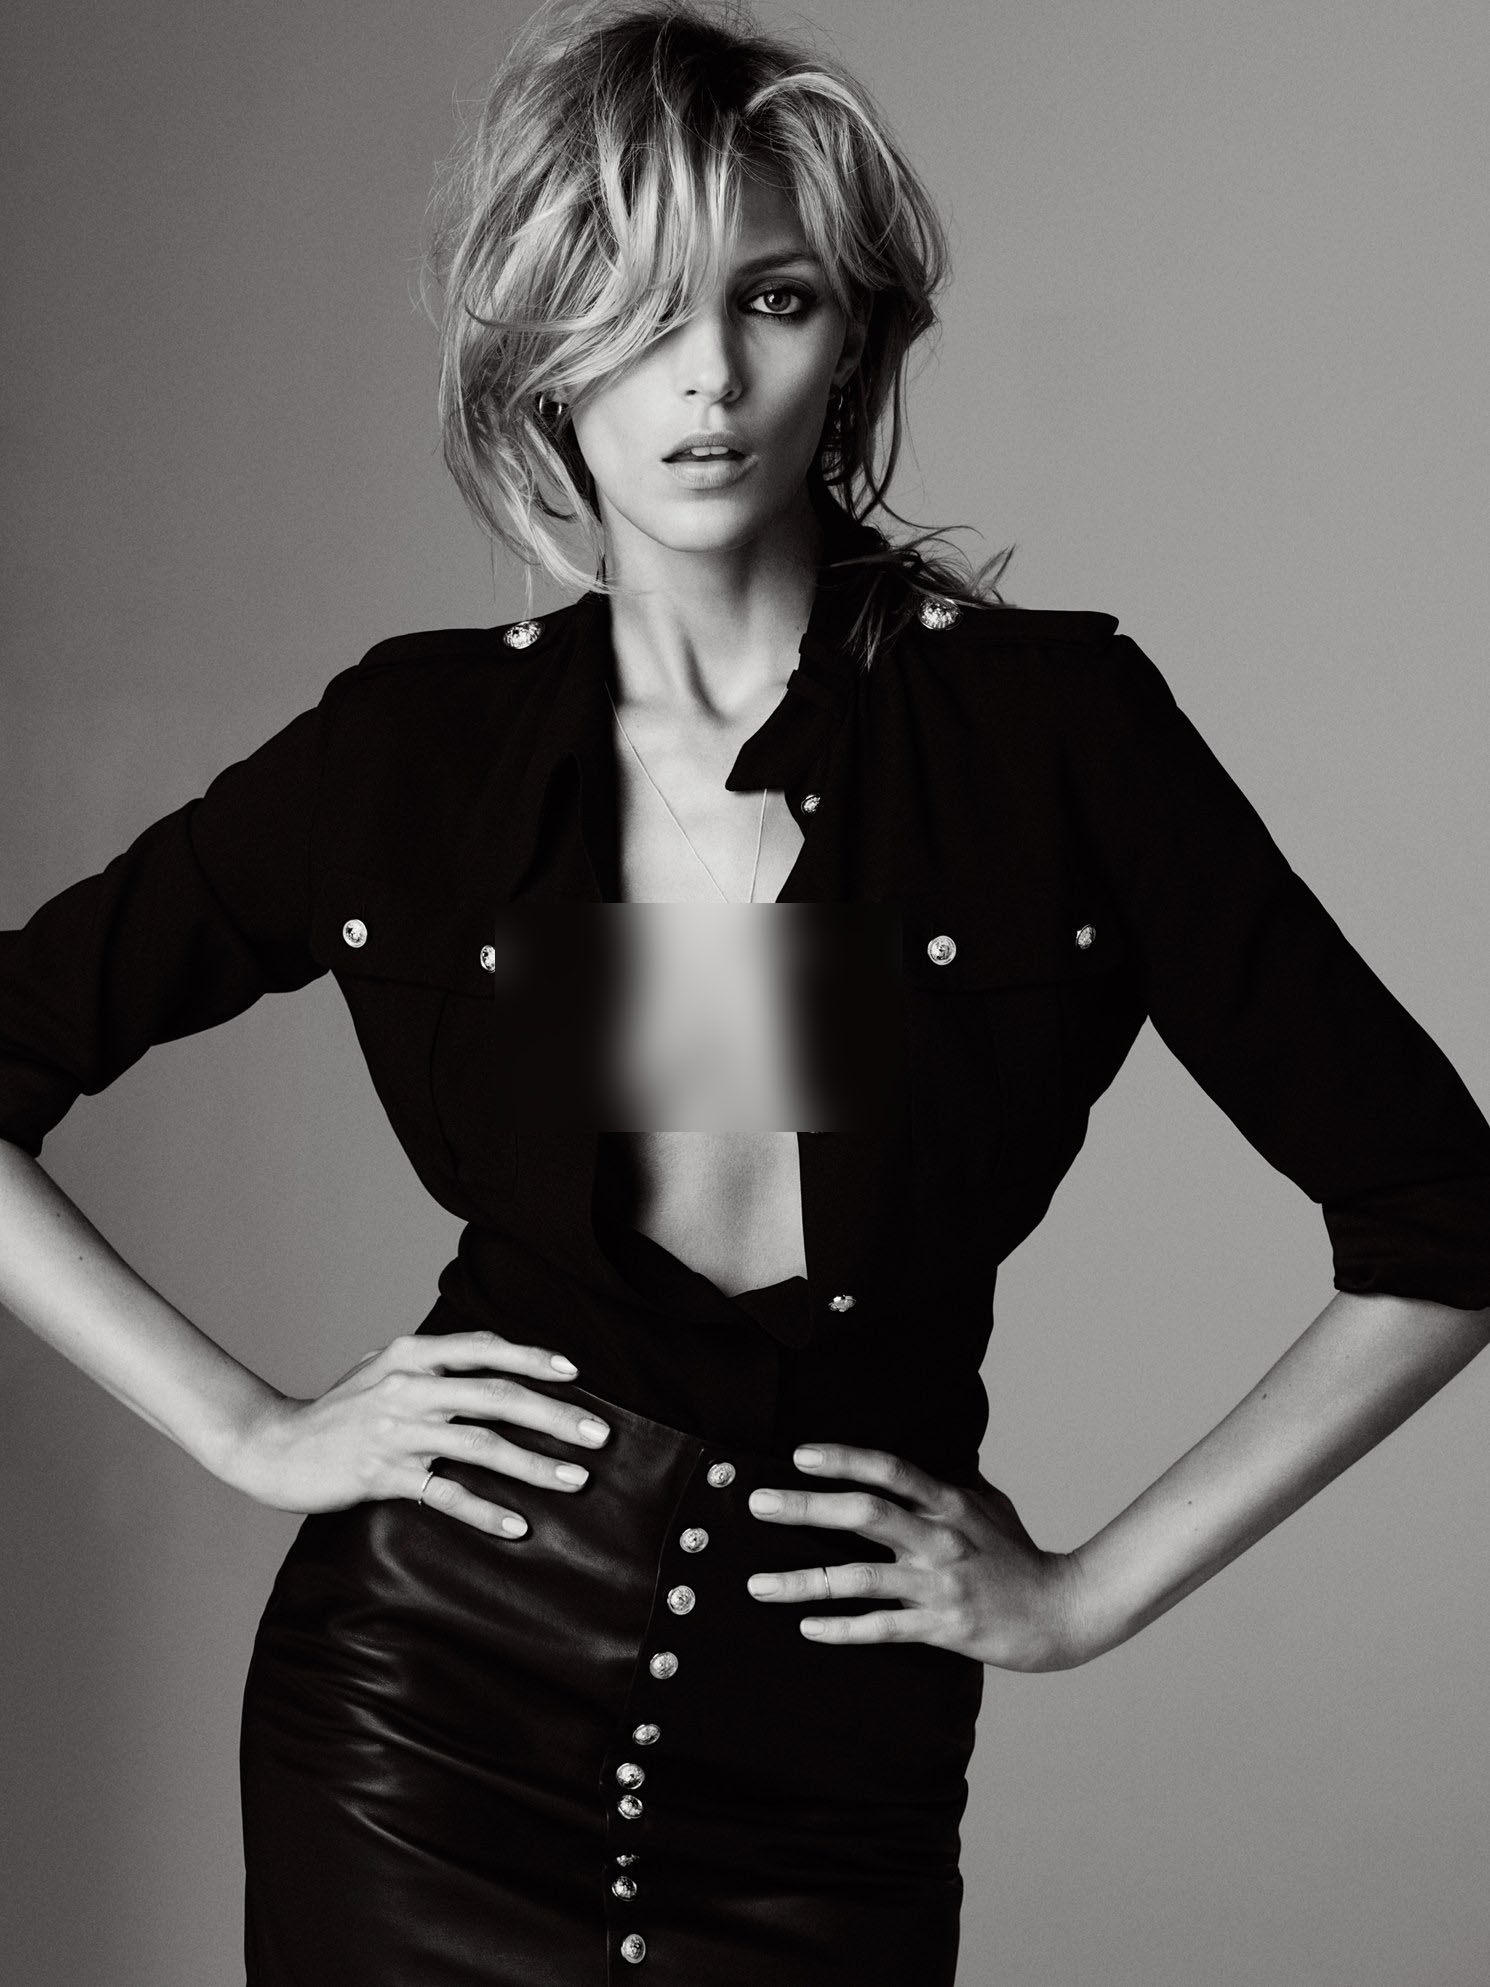 Anja Rubik photoshoot for Elle Serbia